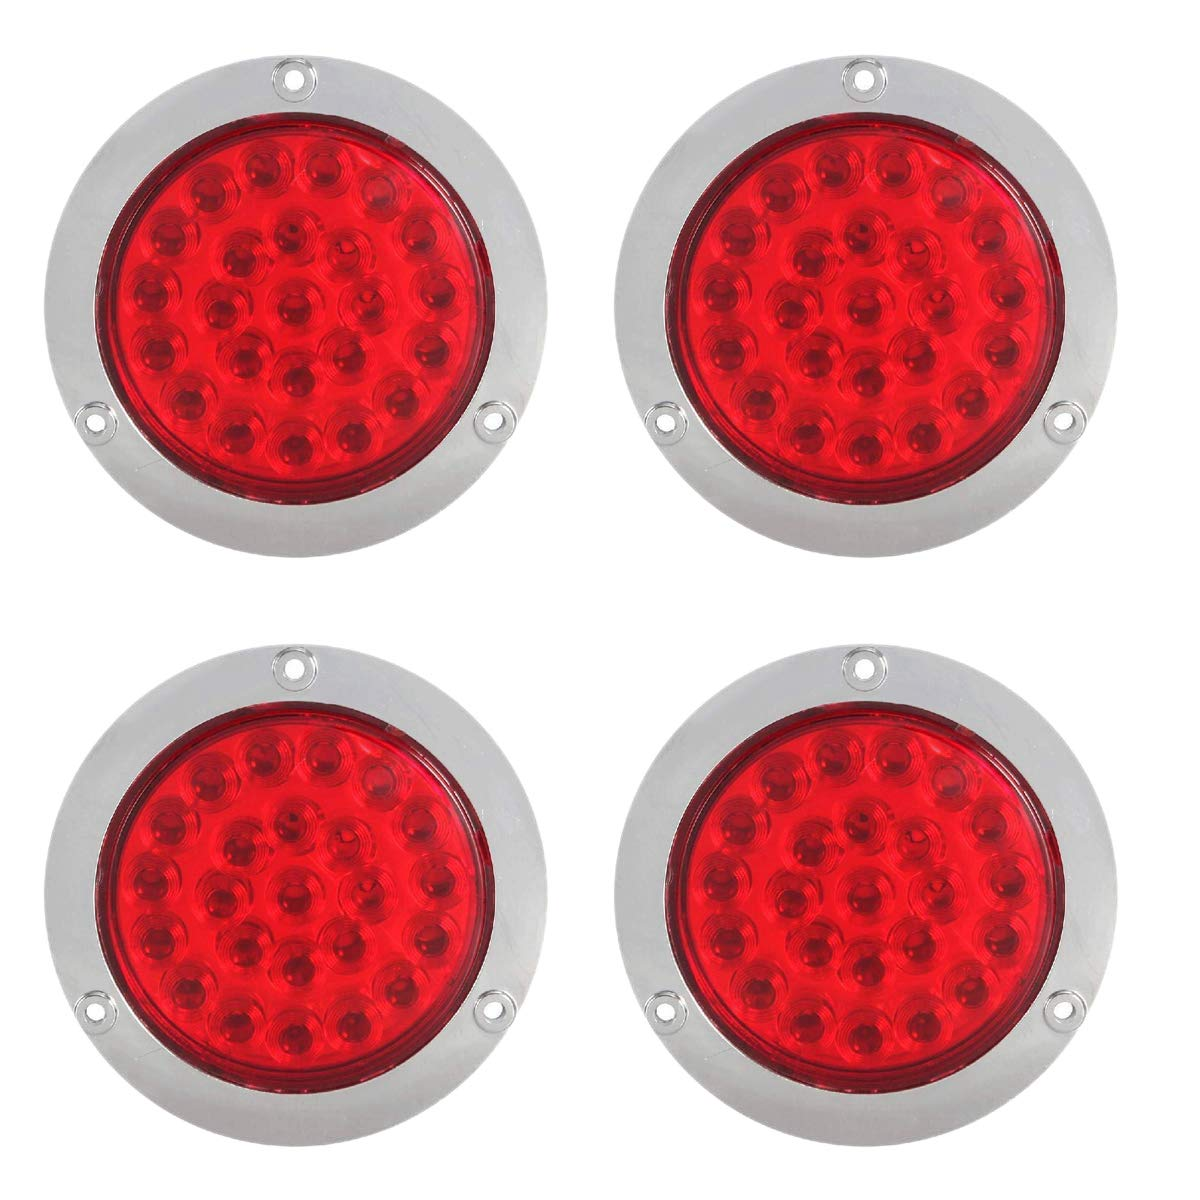 TOOGOO 4 Pack Round Led Trailer Tail Lights Red 24 Led Flange Mount Waterproof Chrome 4 Brake Stop Turn Lights